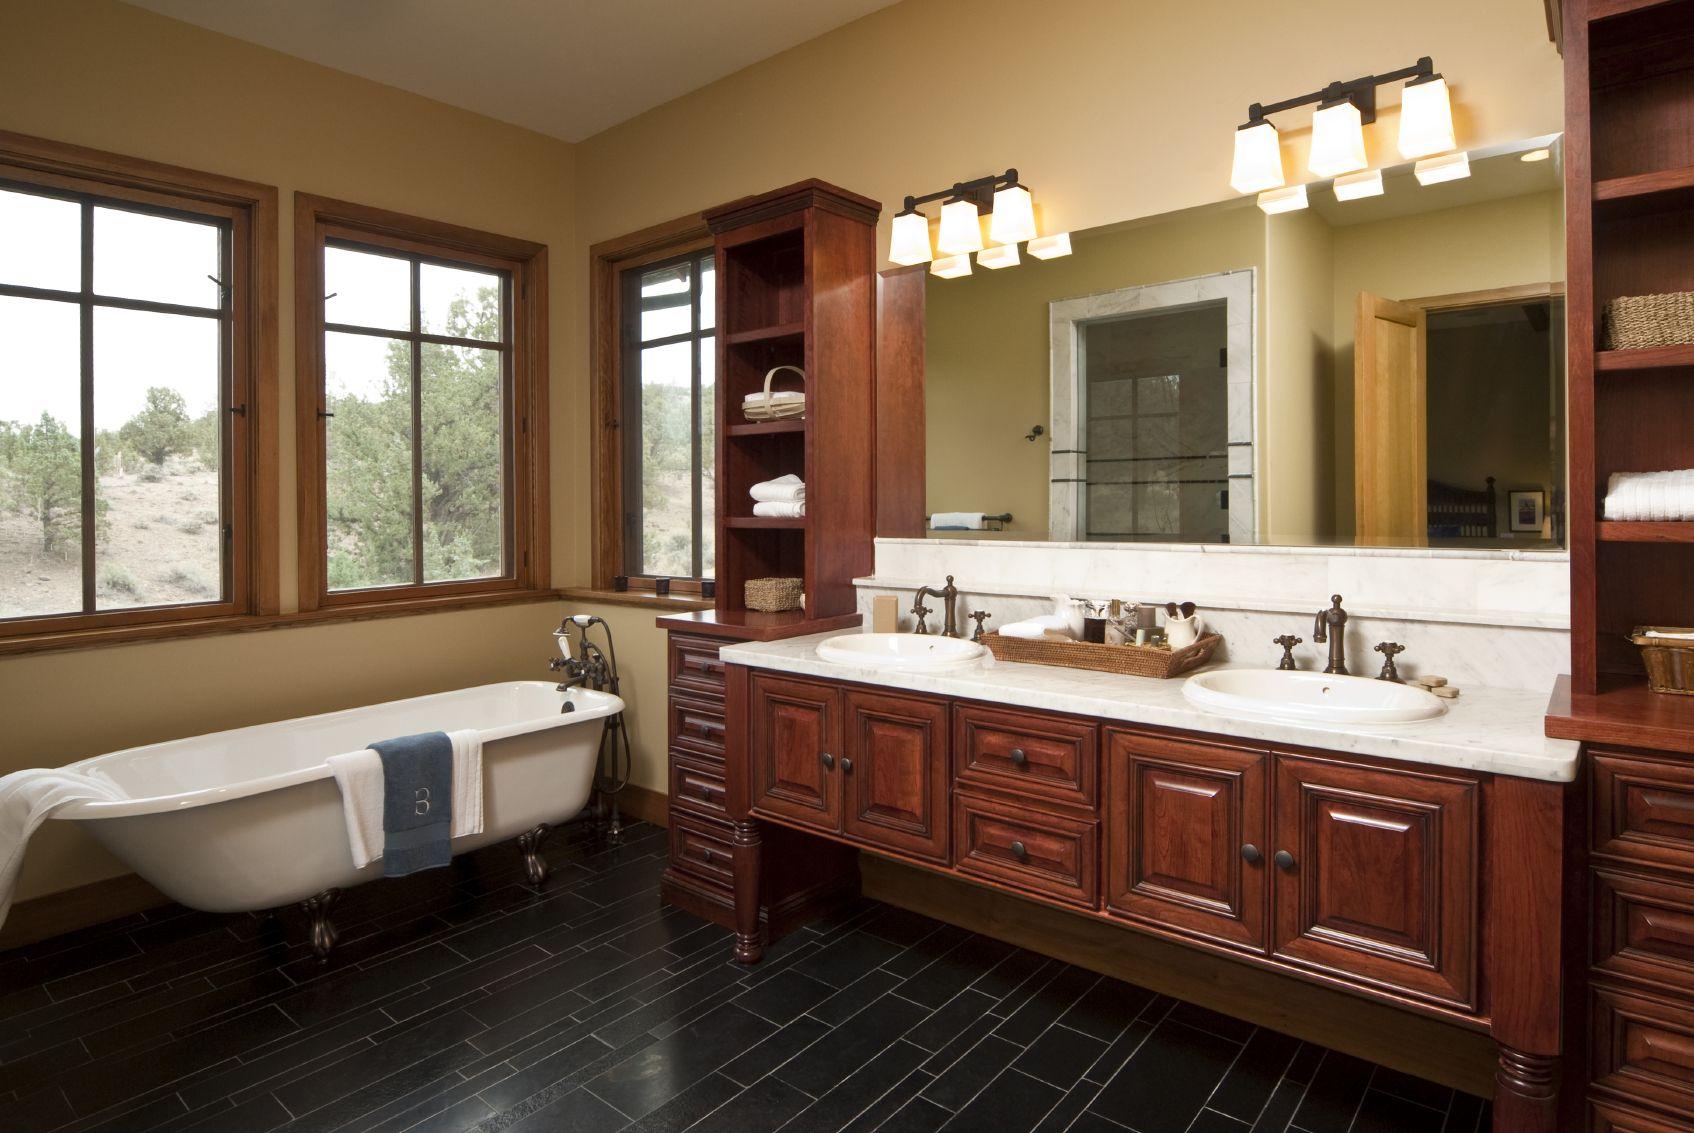 Bathroom Exclusive Teak Wood Double Vanity Bathroom With White Pleasing Bathroom Vanities Luxury Design Ideas